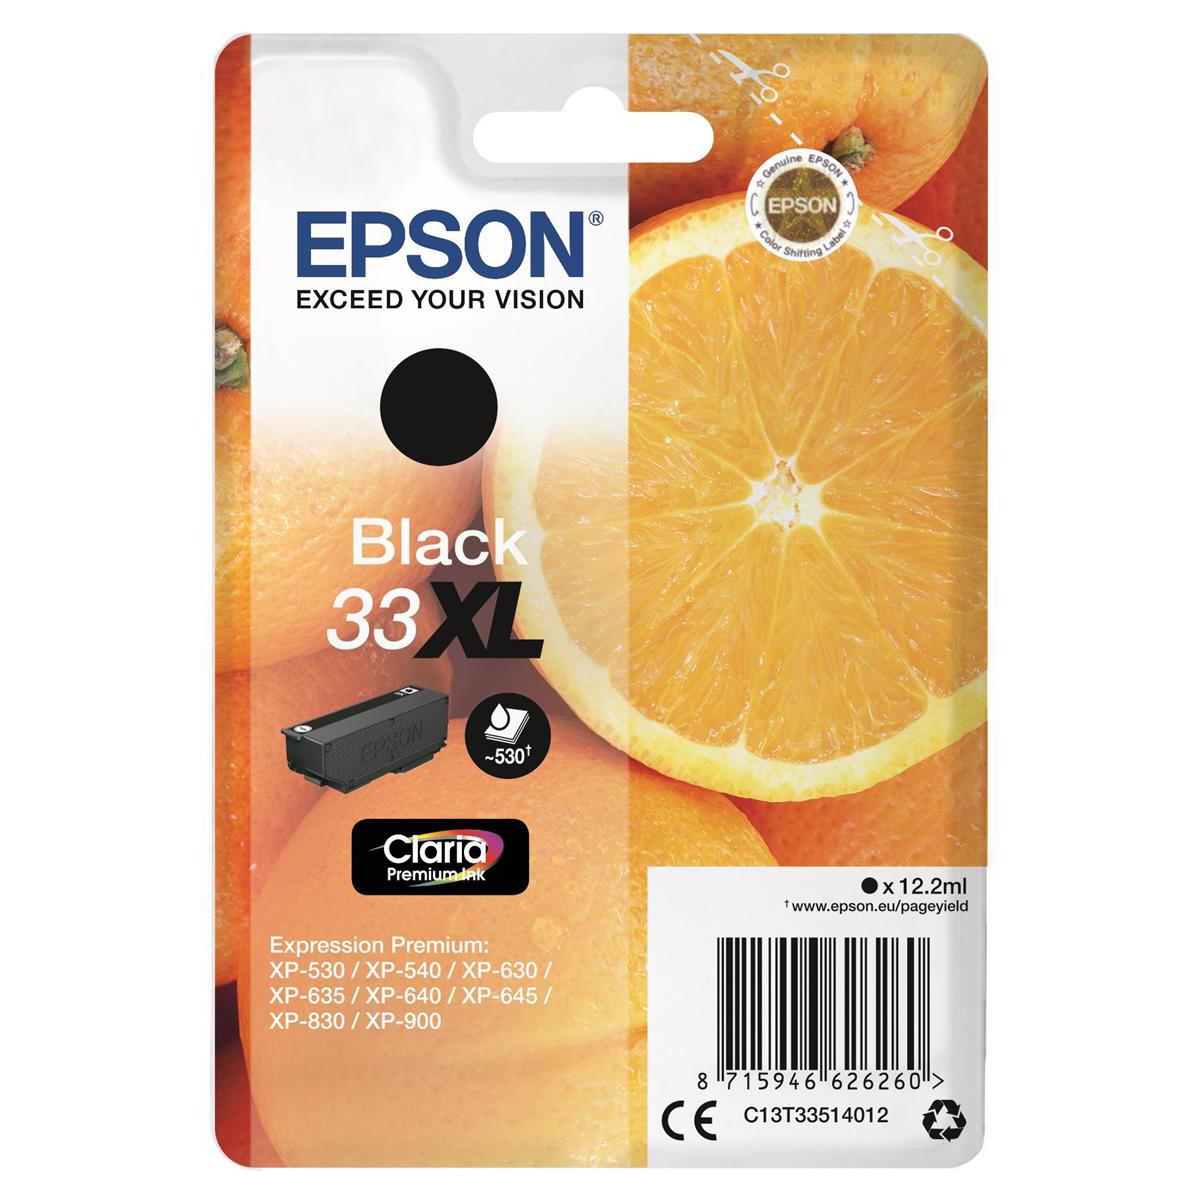 Epson T33XL Inkjet Cartridge Orange High Yield Page Life 530pp 12.2ml Black Ref C13T33514012